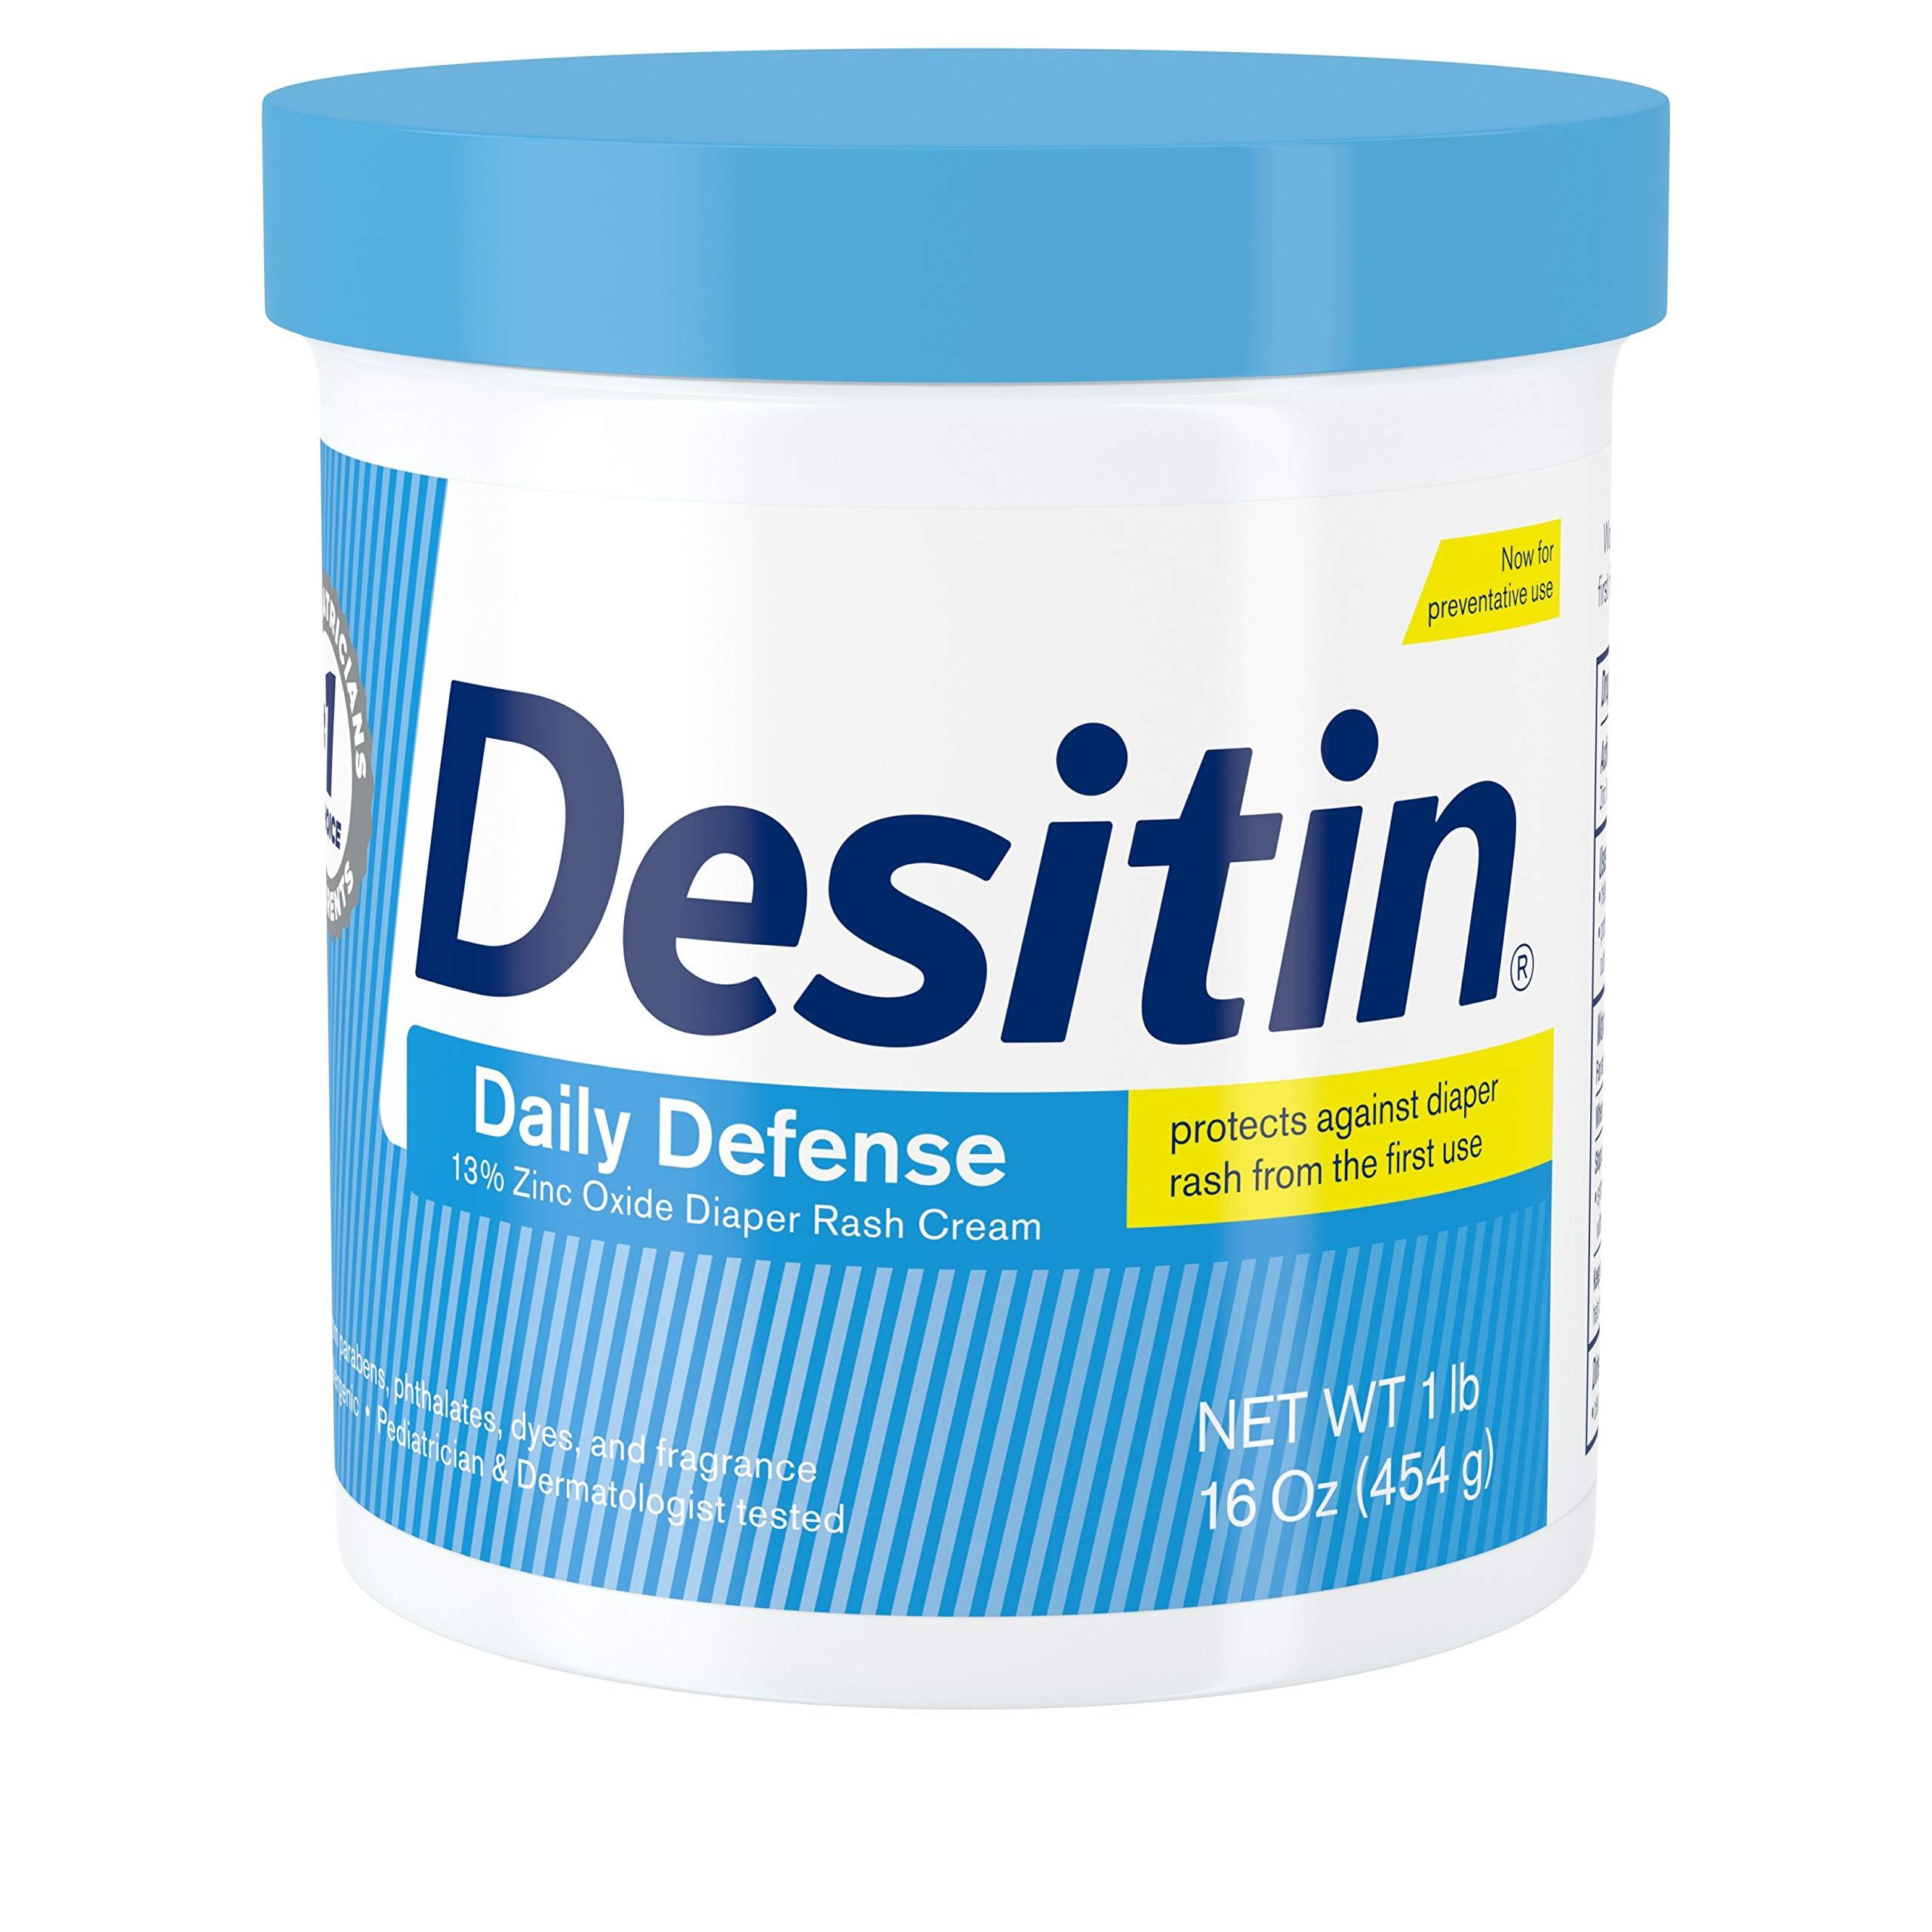 Desitin Daily Defense Baby Diaper Rash Cream with Zinc Oxide to Treat, Relieve & Prevent diaper rash, 16 oz by Desitin